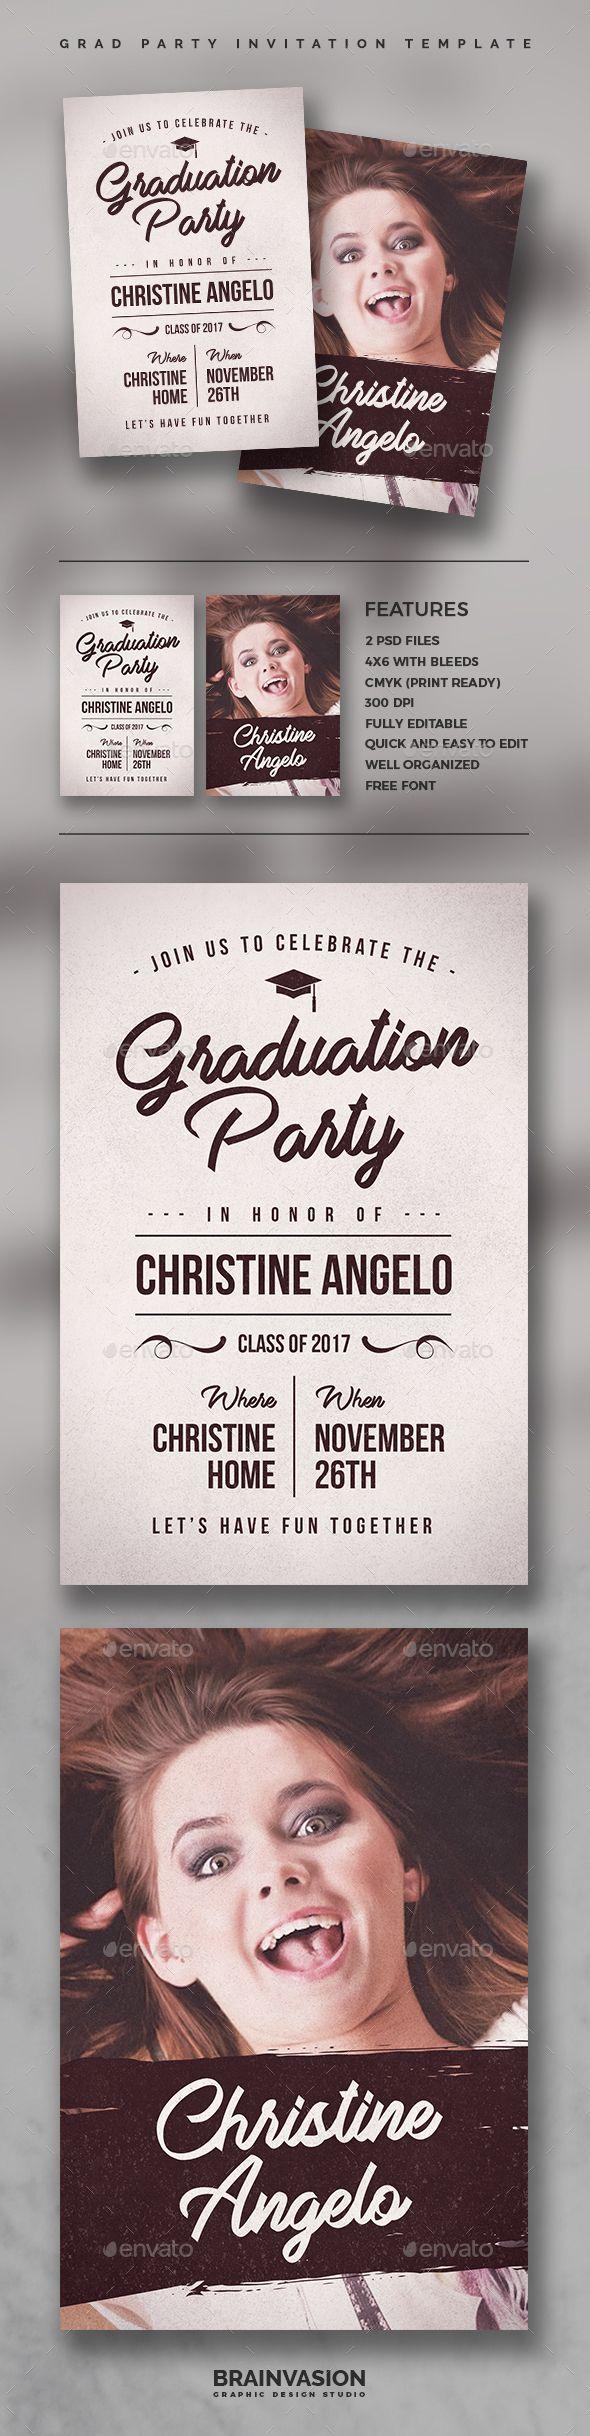 Graduation Party Invitation Template  Afstudeeruitnodigingen